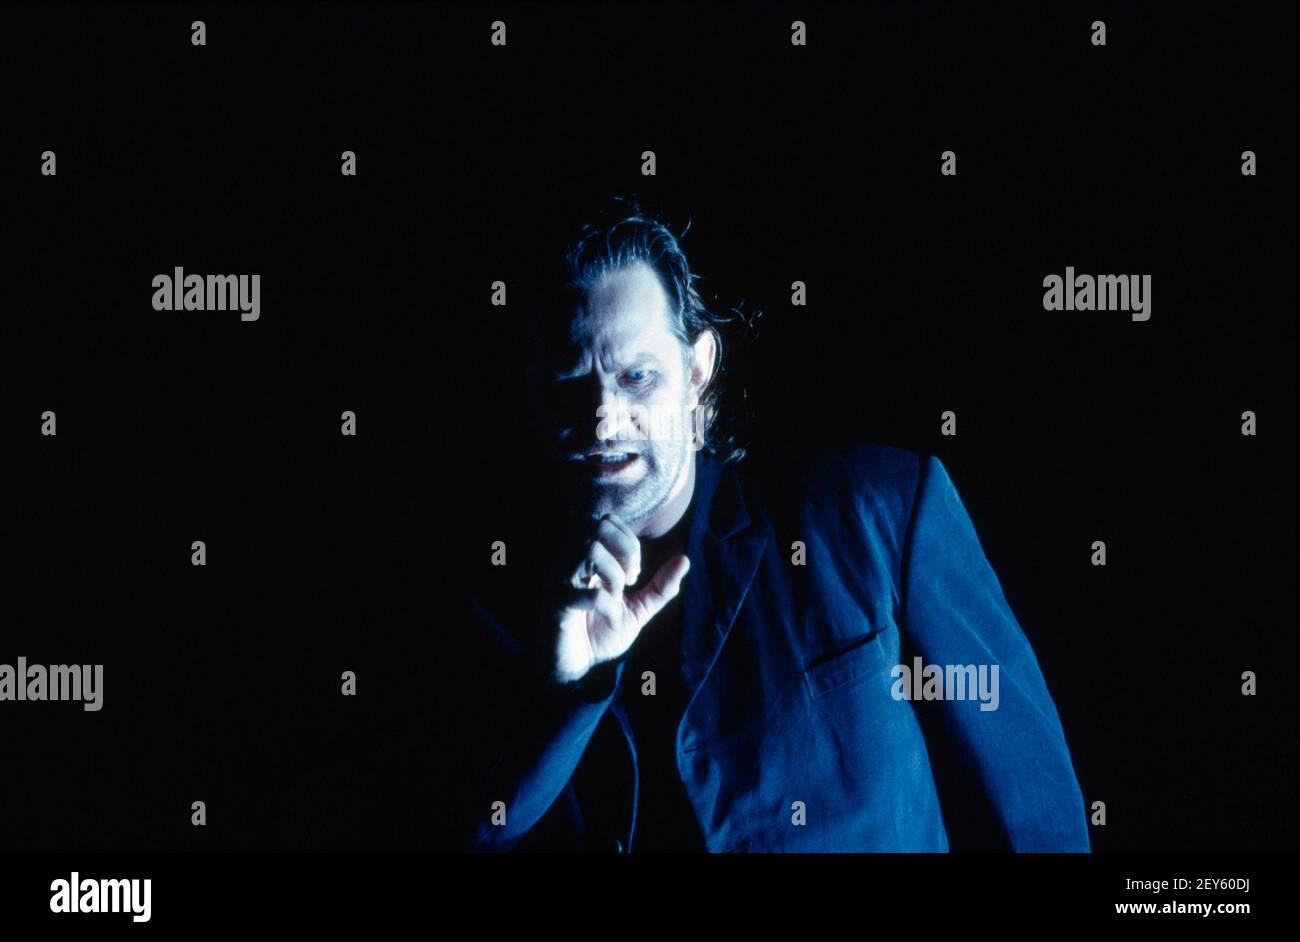 Poul Elming (Siegmund) in DIE WALKMAN di Wagner alla Royal Opera, Covent Garden, Londra WC2 14/10/1994 direttore: Bernard Haitink design: Nigel Lowery illuminazione: Pat Collins movimento: Matthew Hamilton regista: Richard Jones Foto Stock